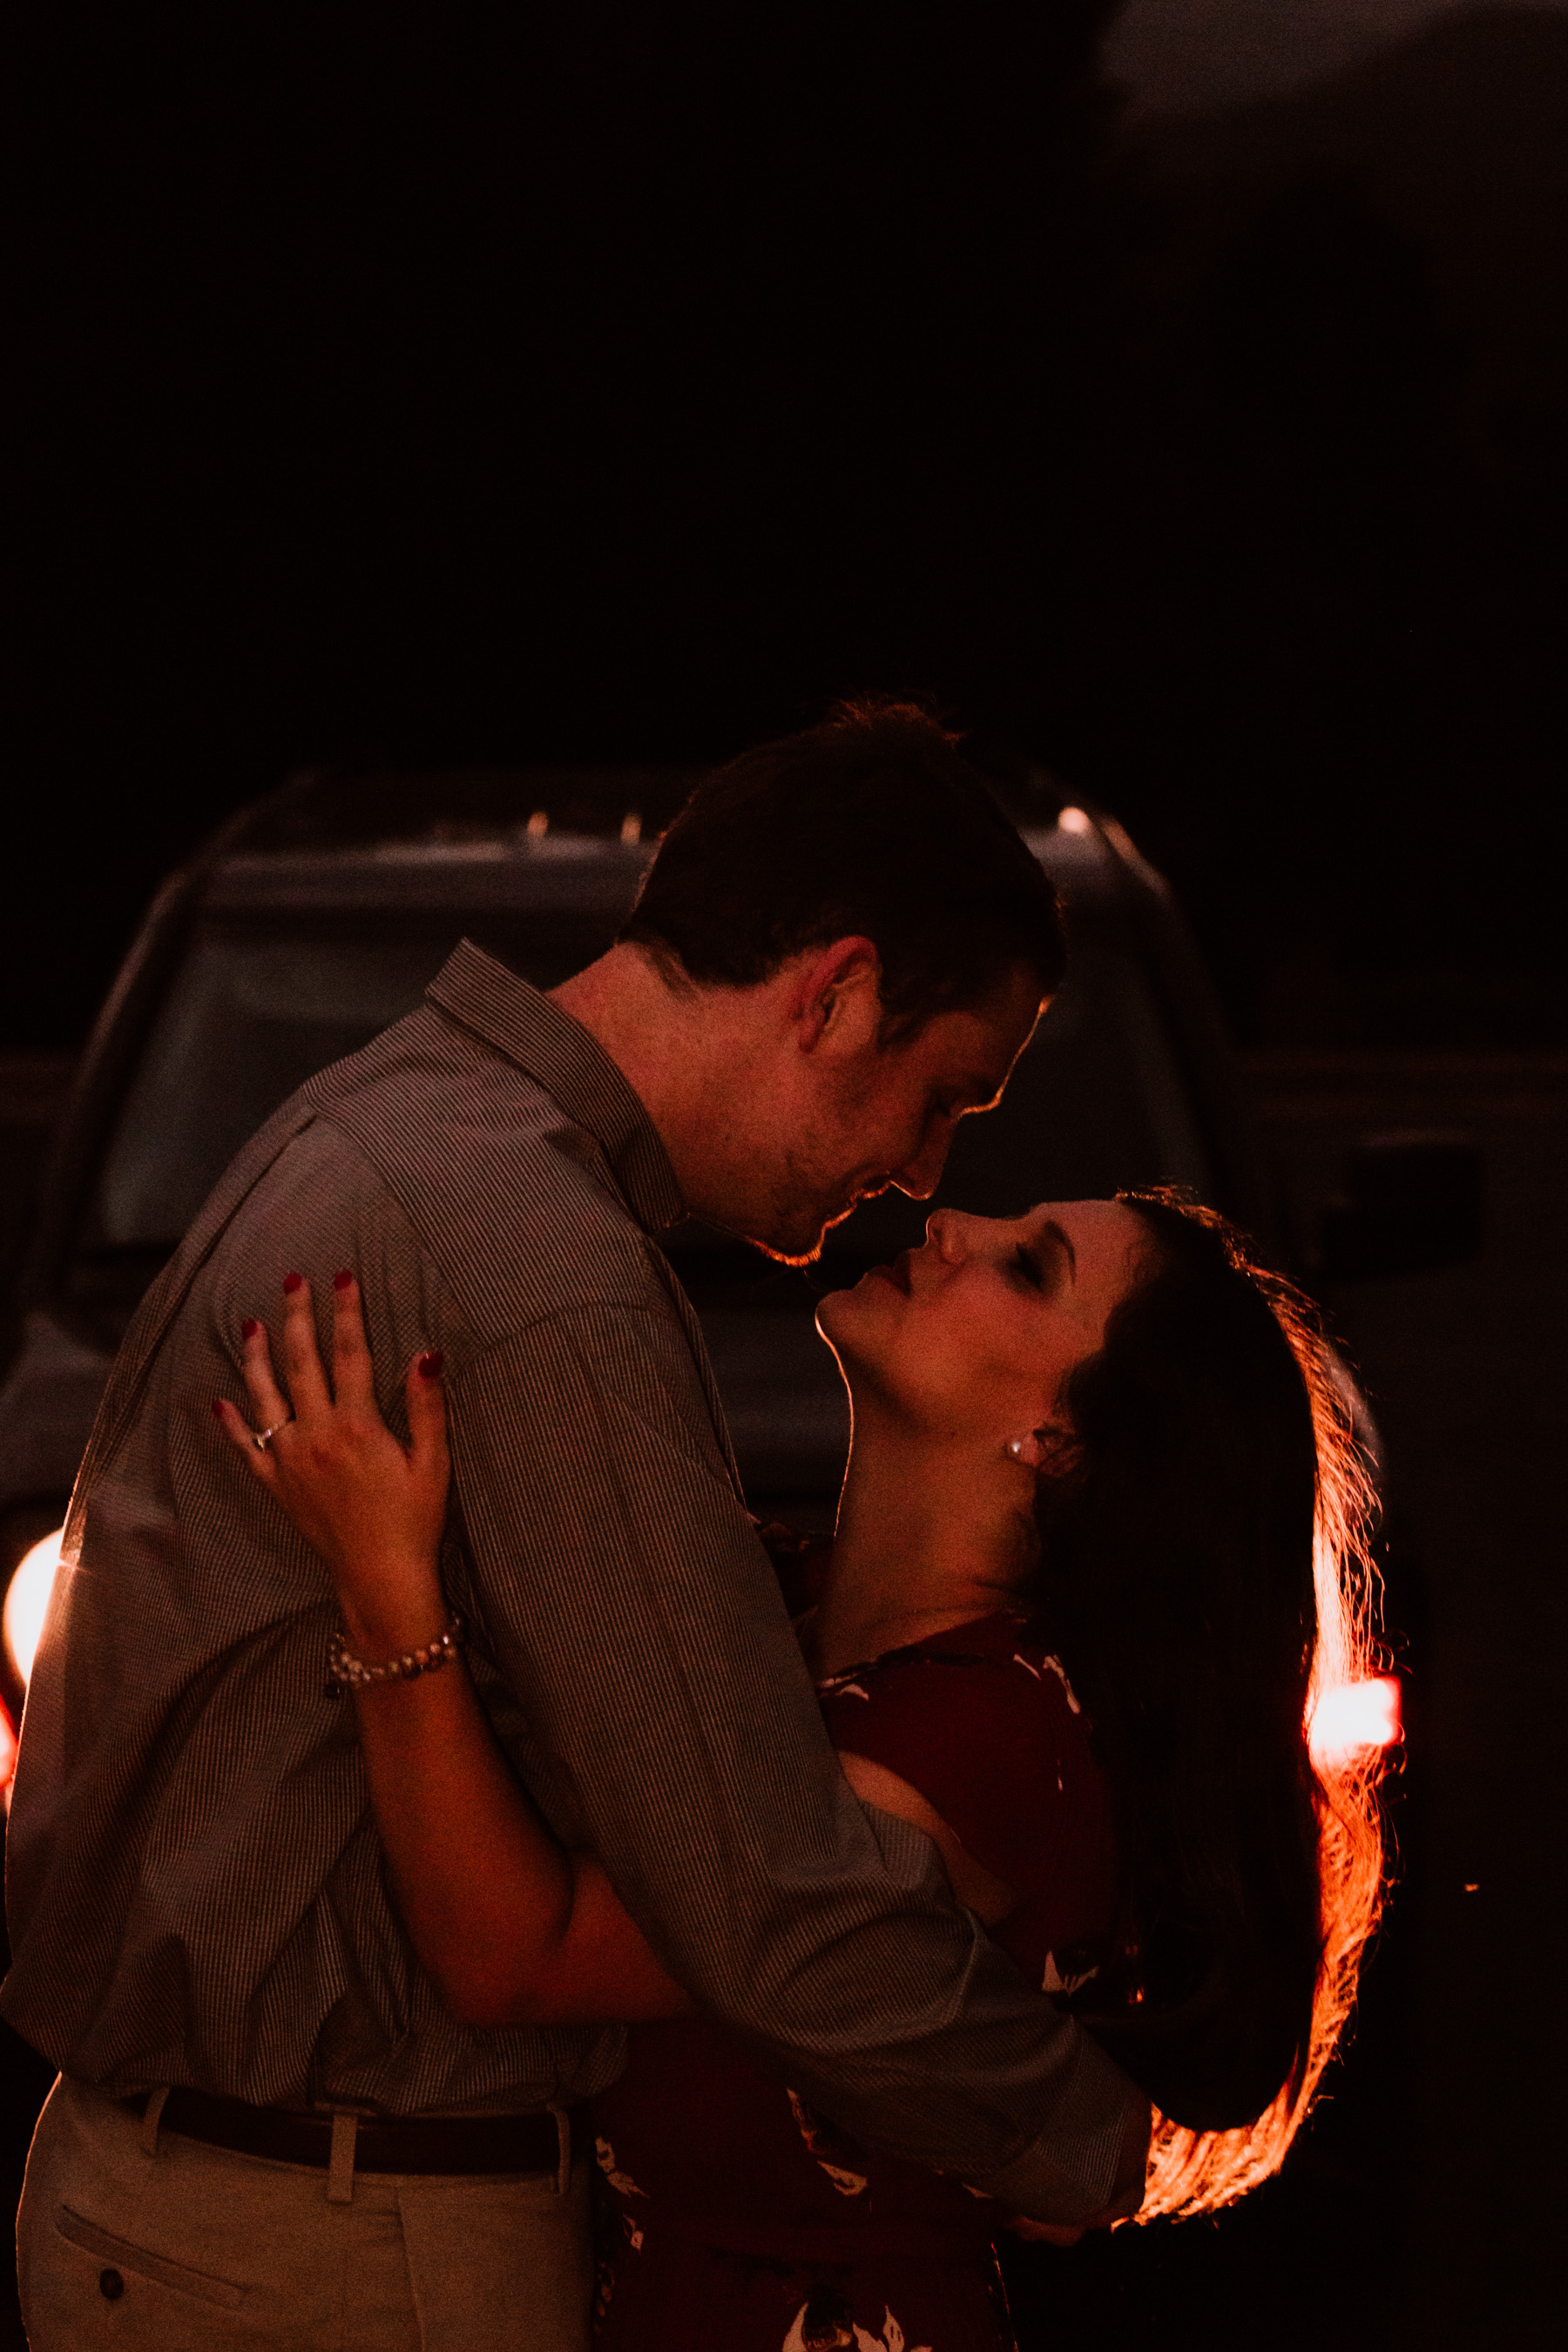 romantic-engagement-photos-sc.jpg